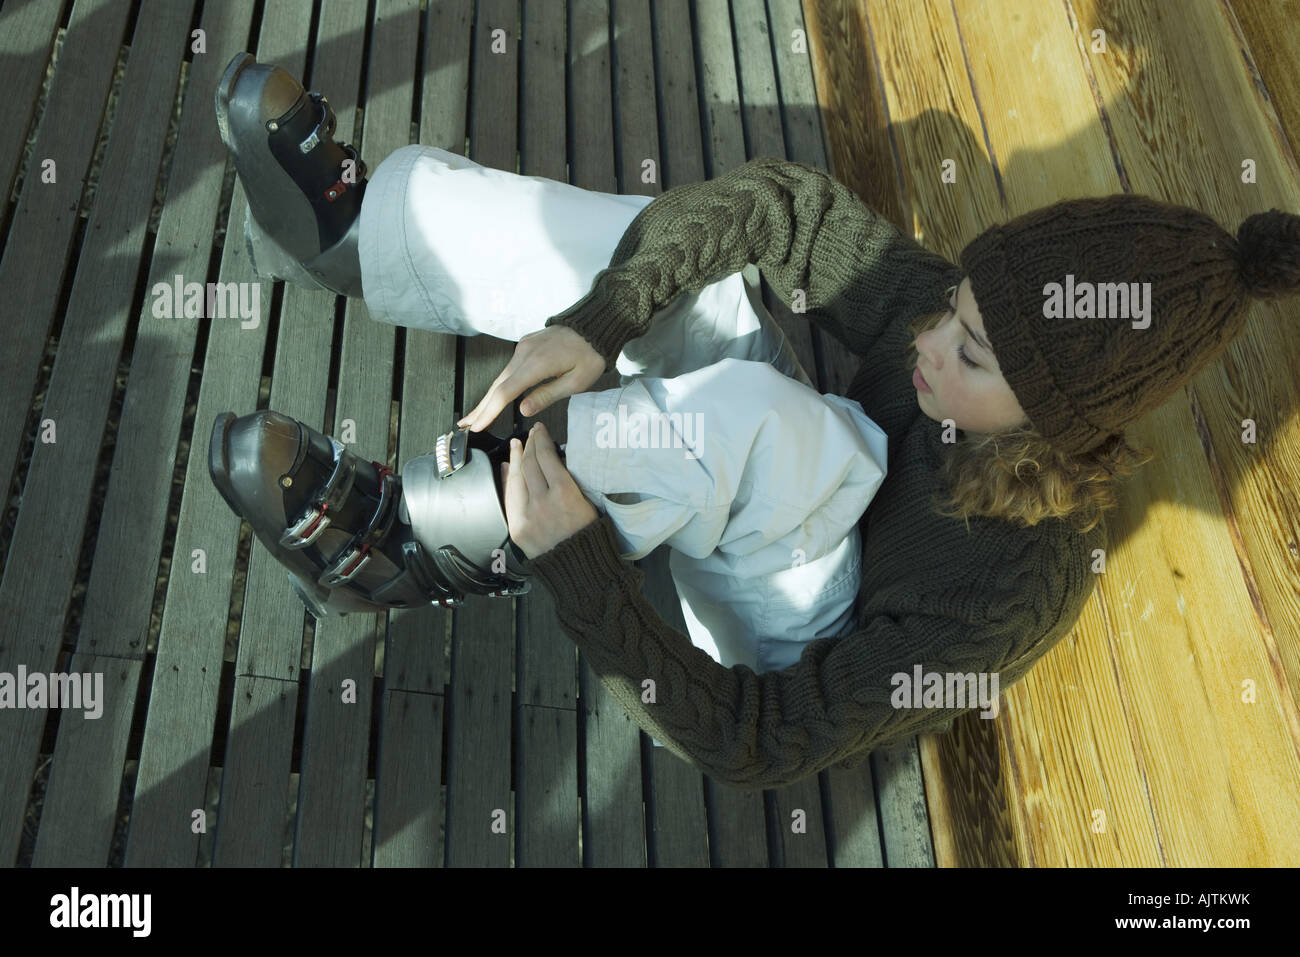 Teen girl putting on ski boots - Stock Image